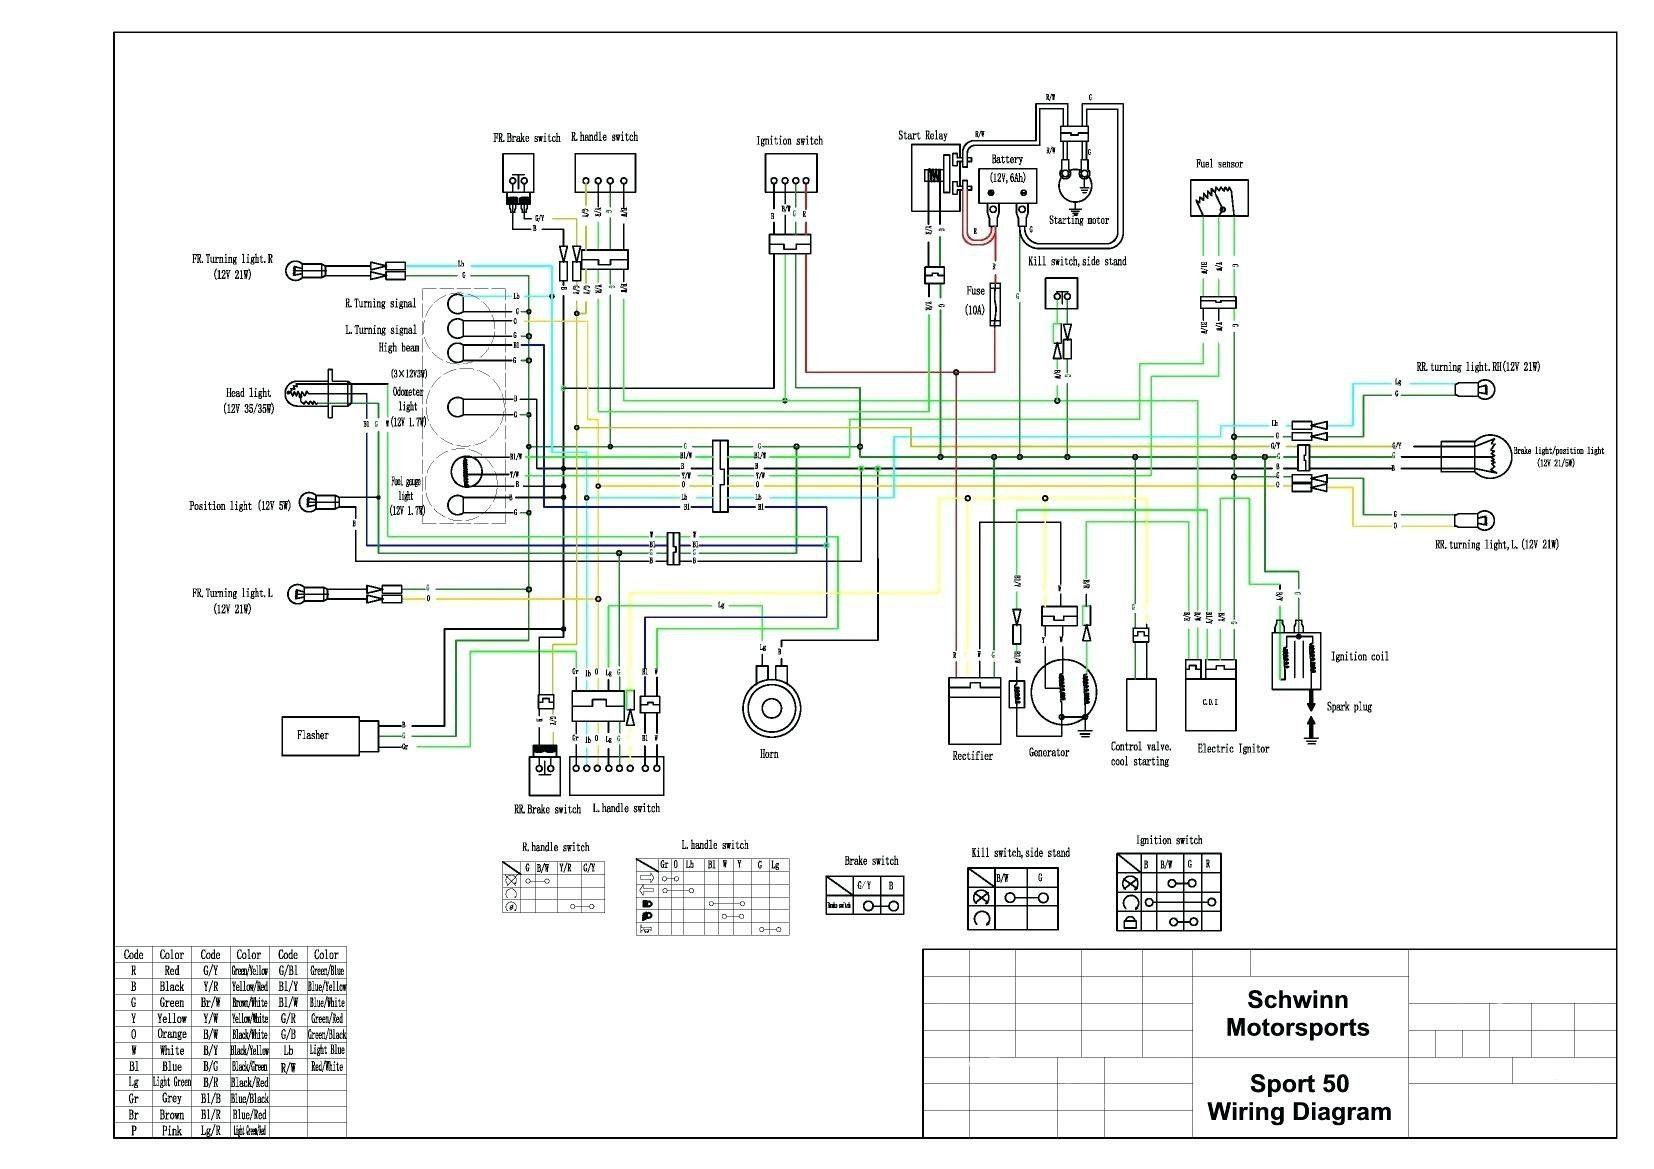 Taotao 50 Wiring Diagram New in 2020 Electrical wiring